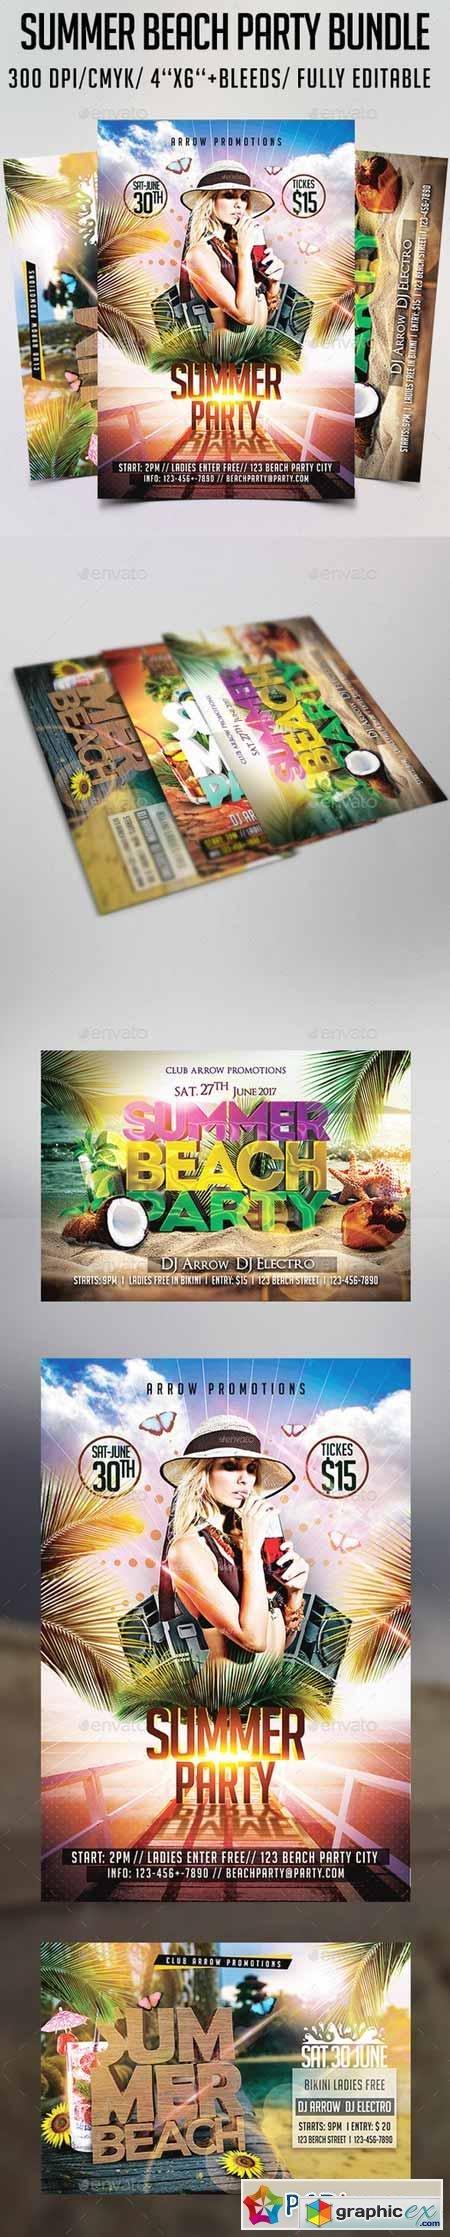 Summer Beach Party Flyer Bundle 12253467 » Free Download